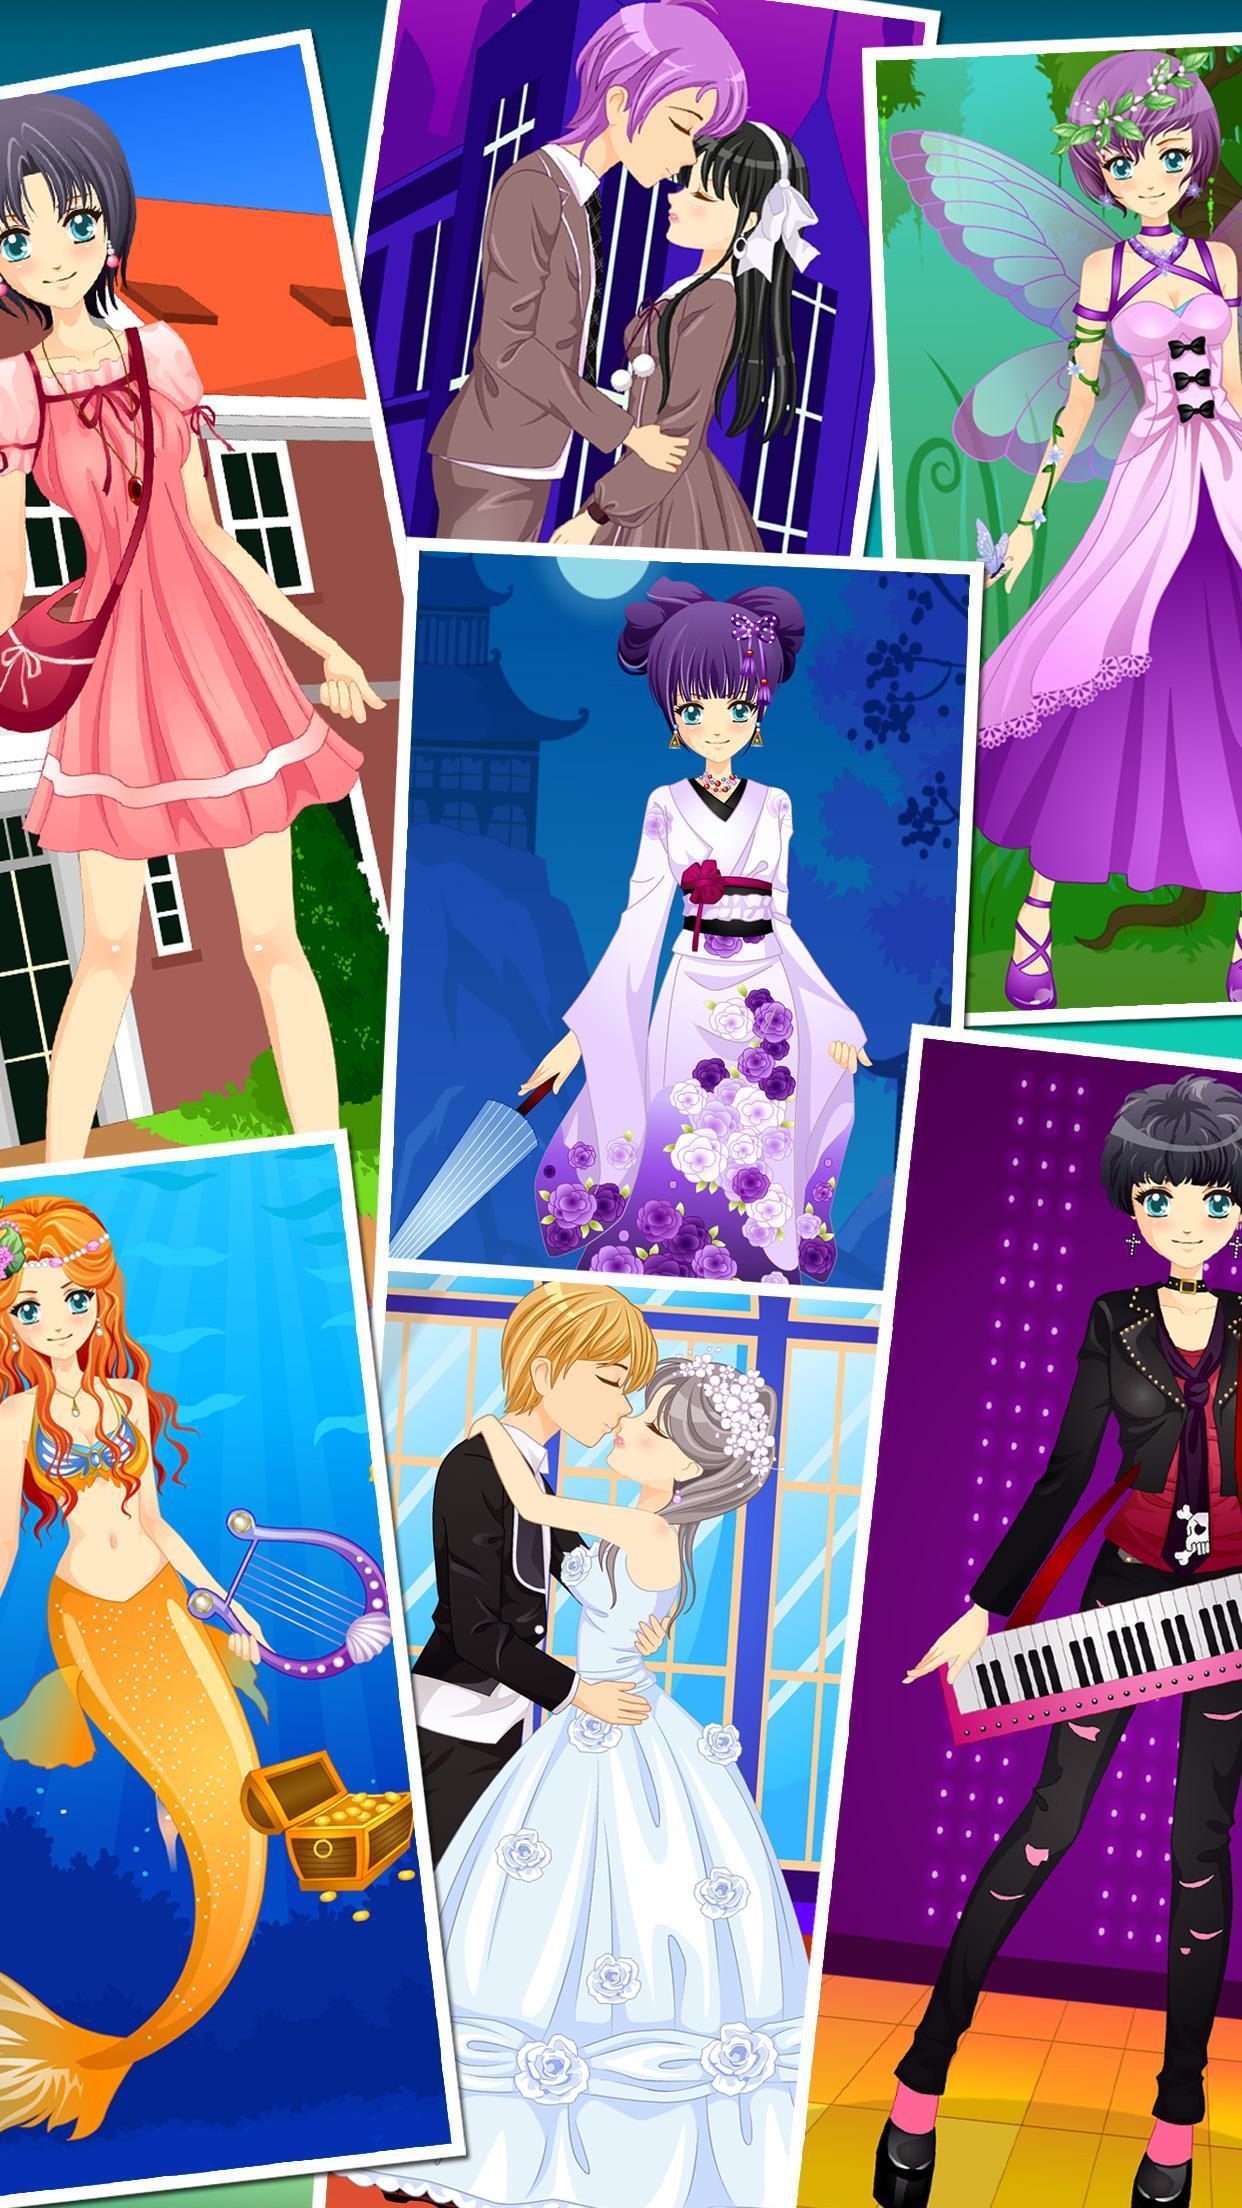 Anime Dress Up Games For Girls - Couple Love Kiss 3.3 Screenshot 9